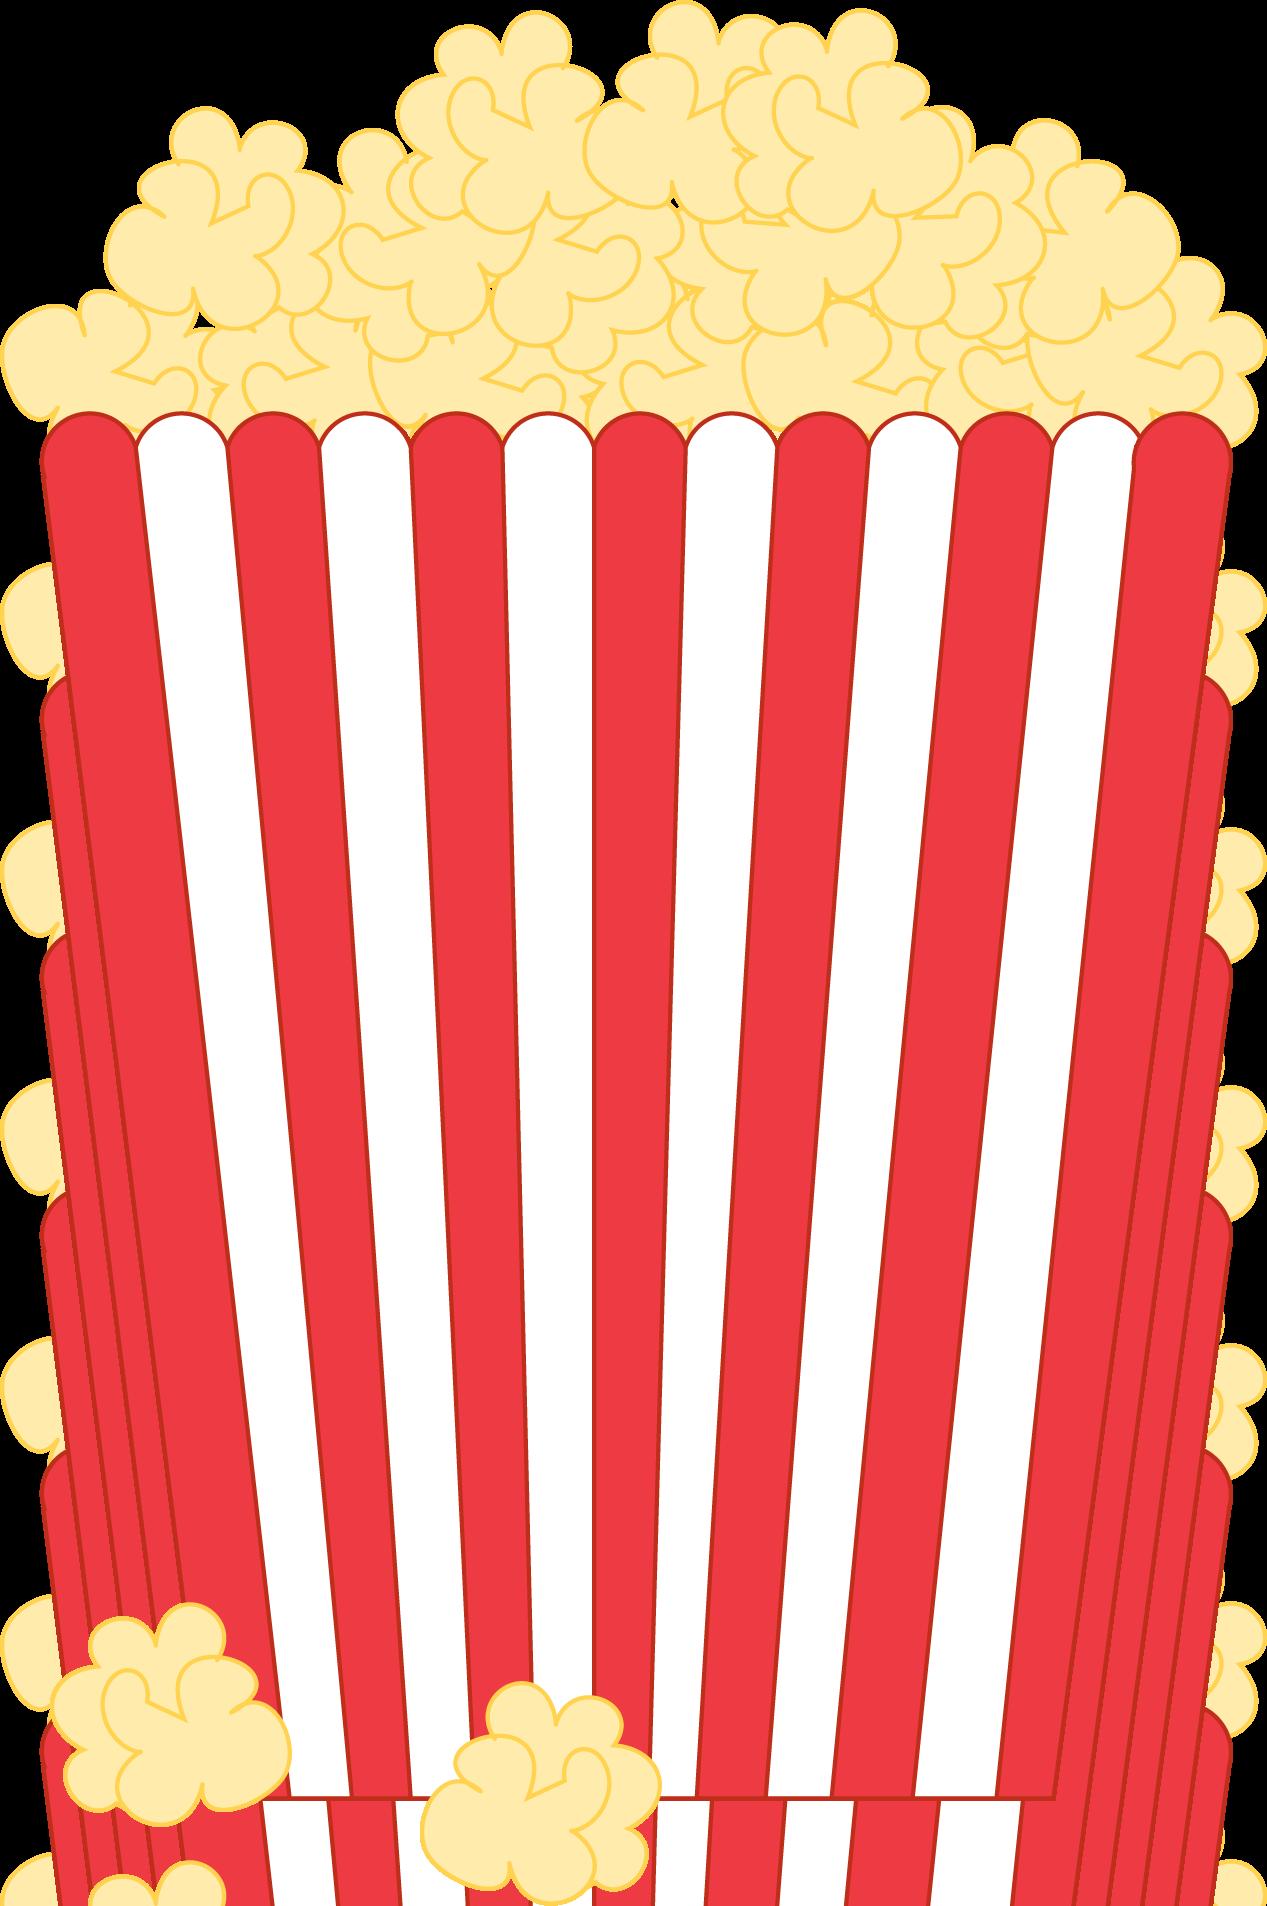 Clip Art Clipart Popcorn popcorn clipart kid popcorn